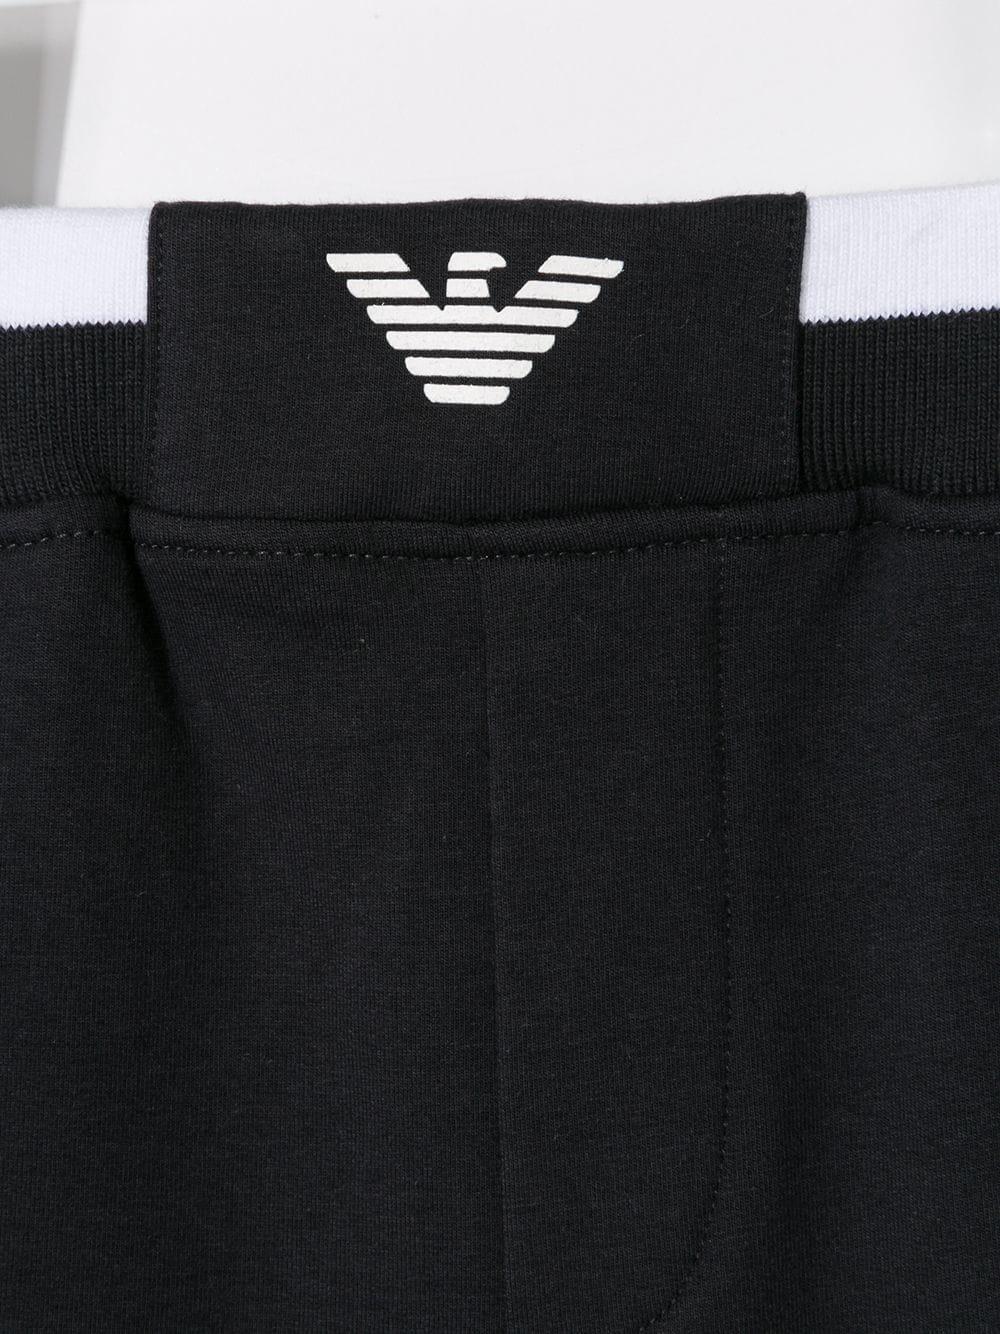 8d4a01fe2 Kids pantalones cortos de deporte - negro